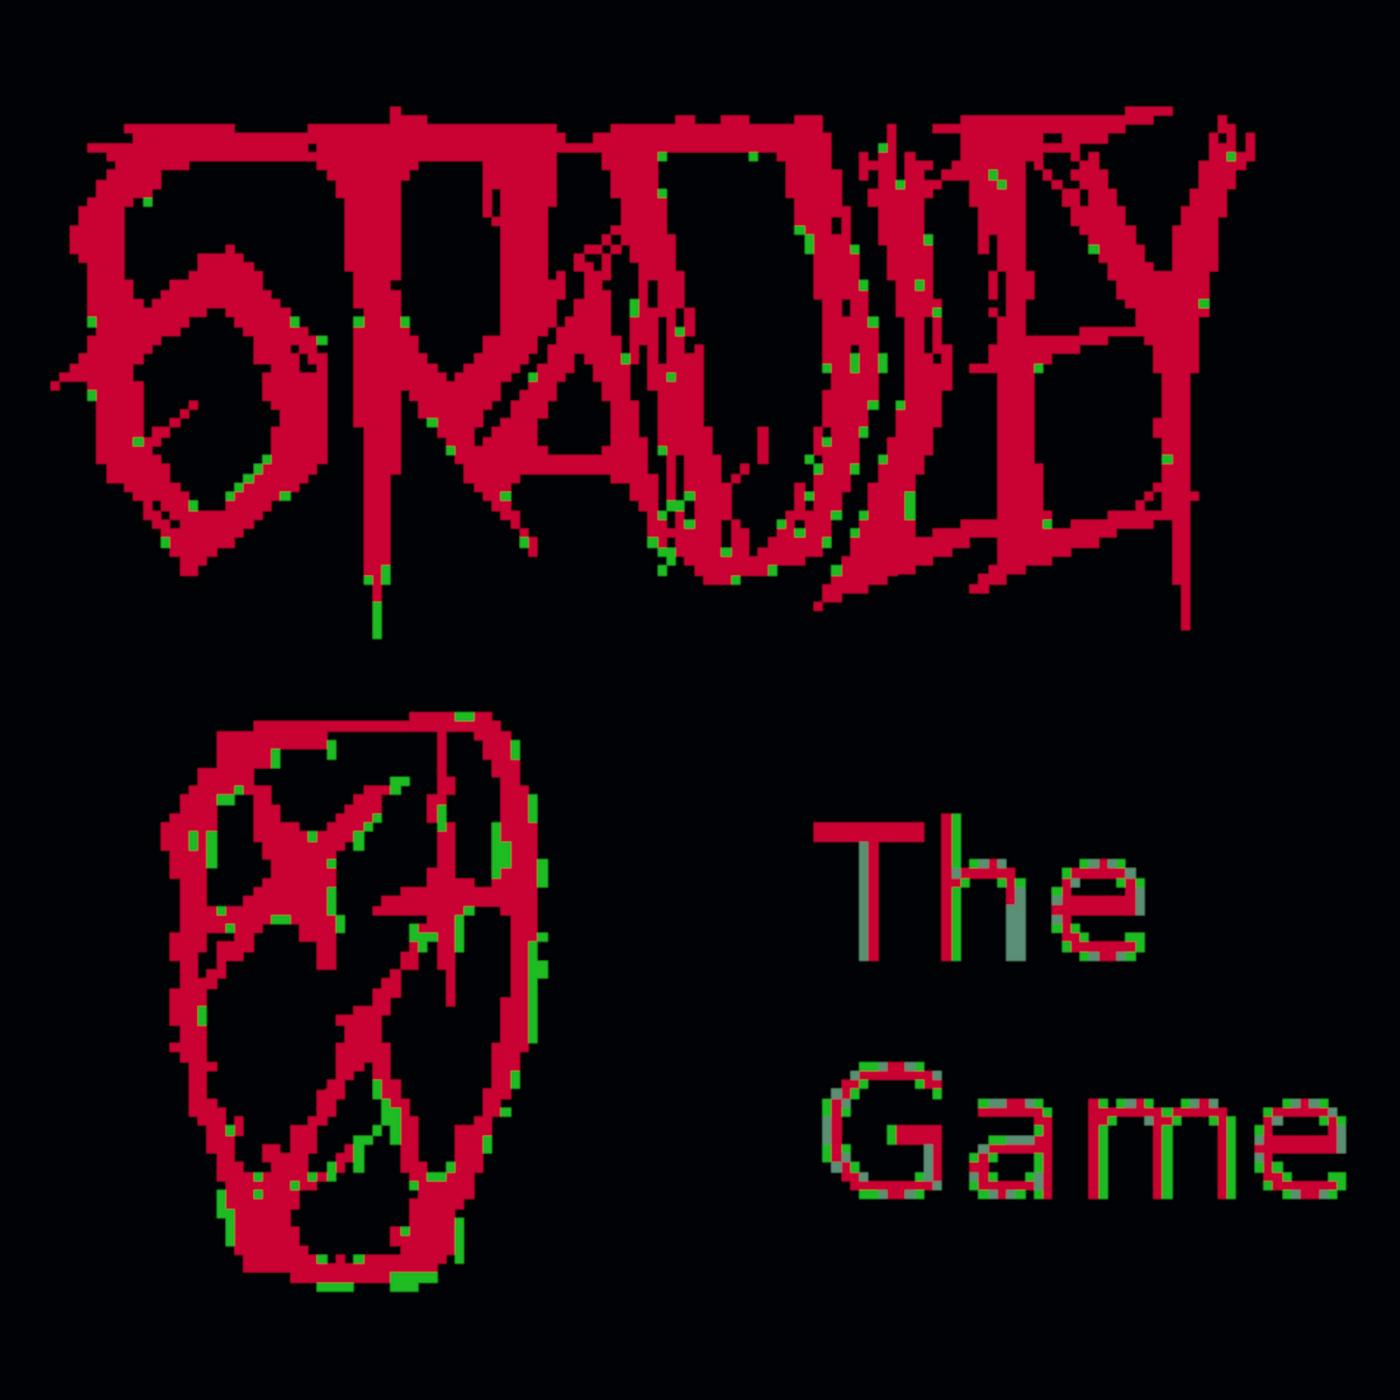 6radley The Game